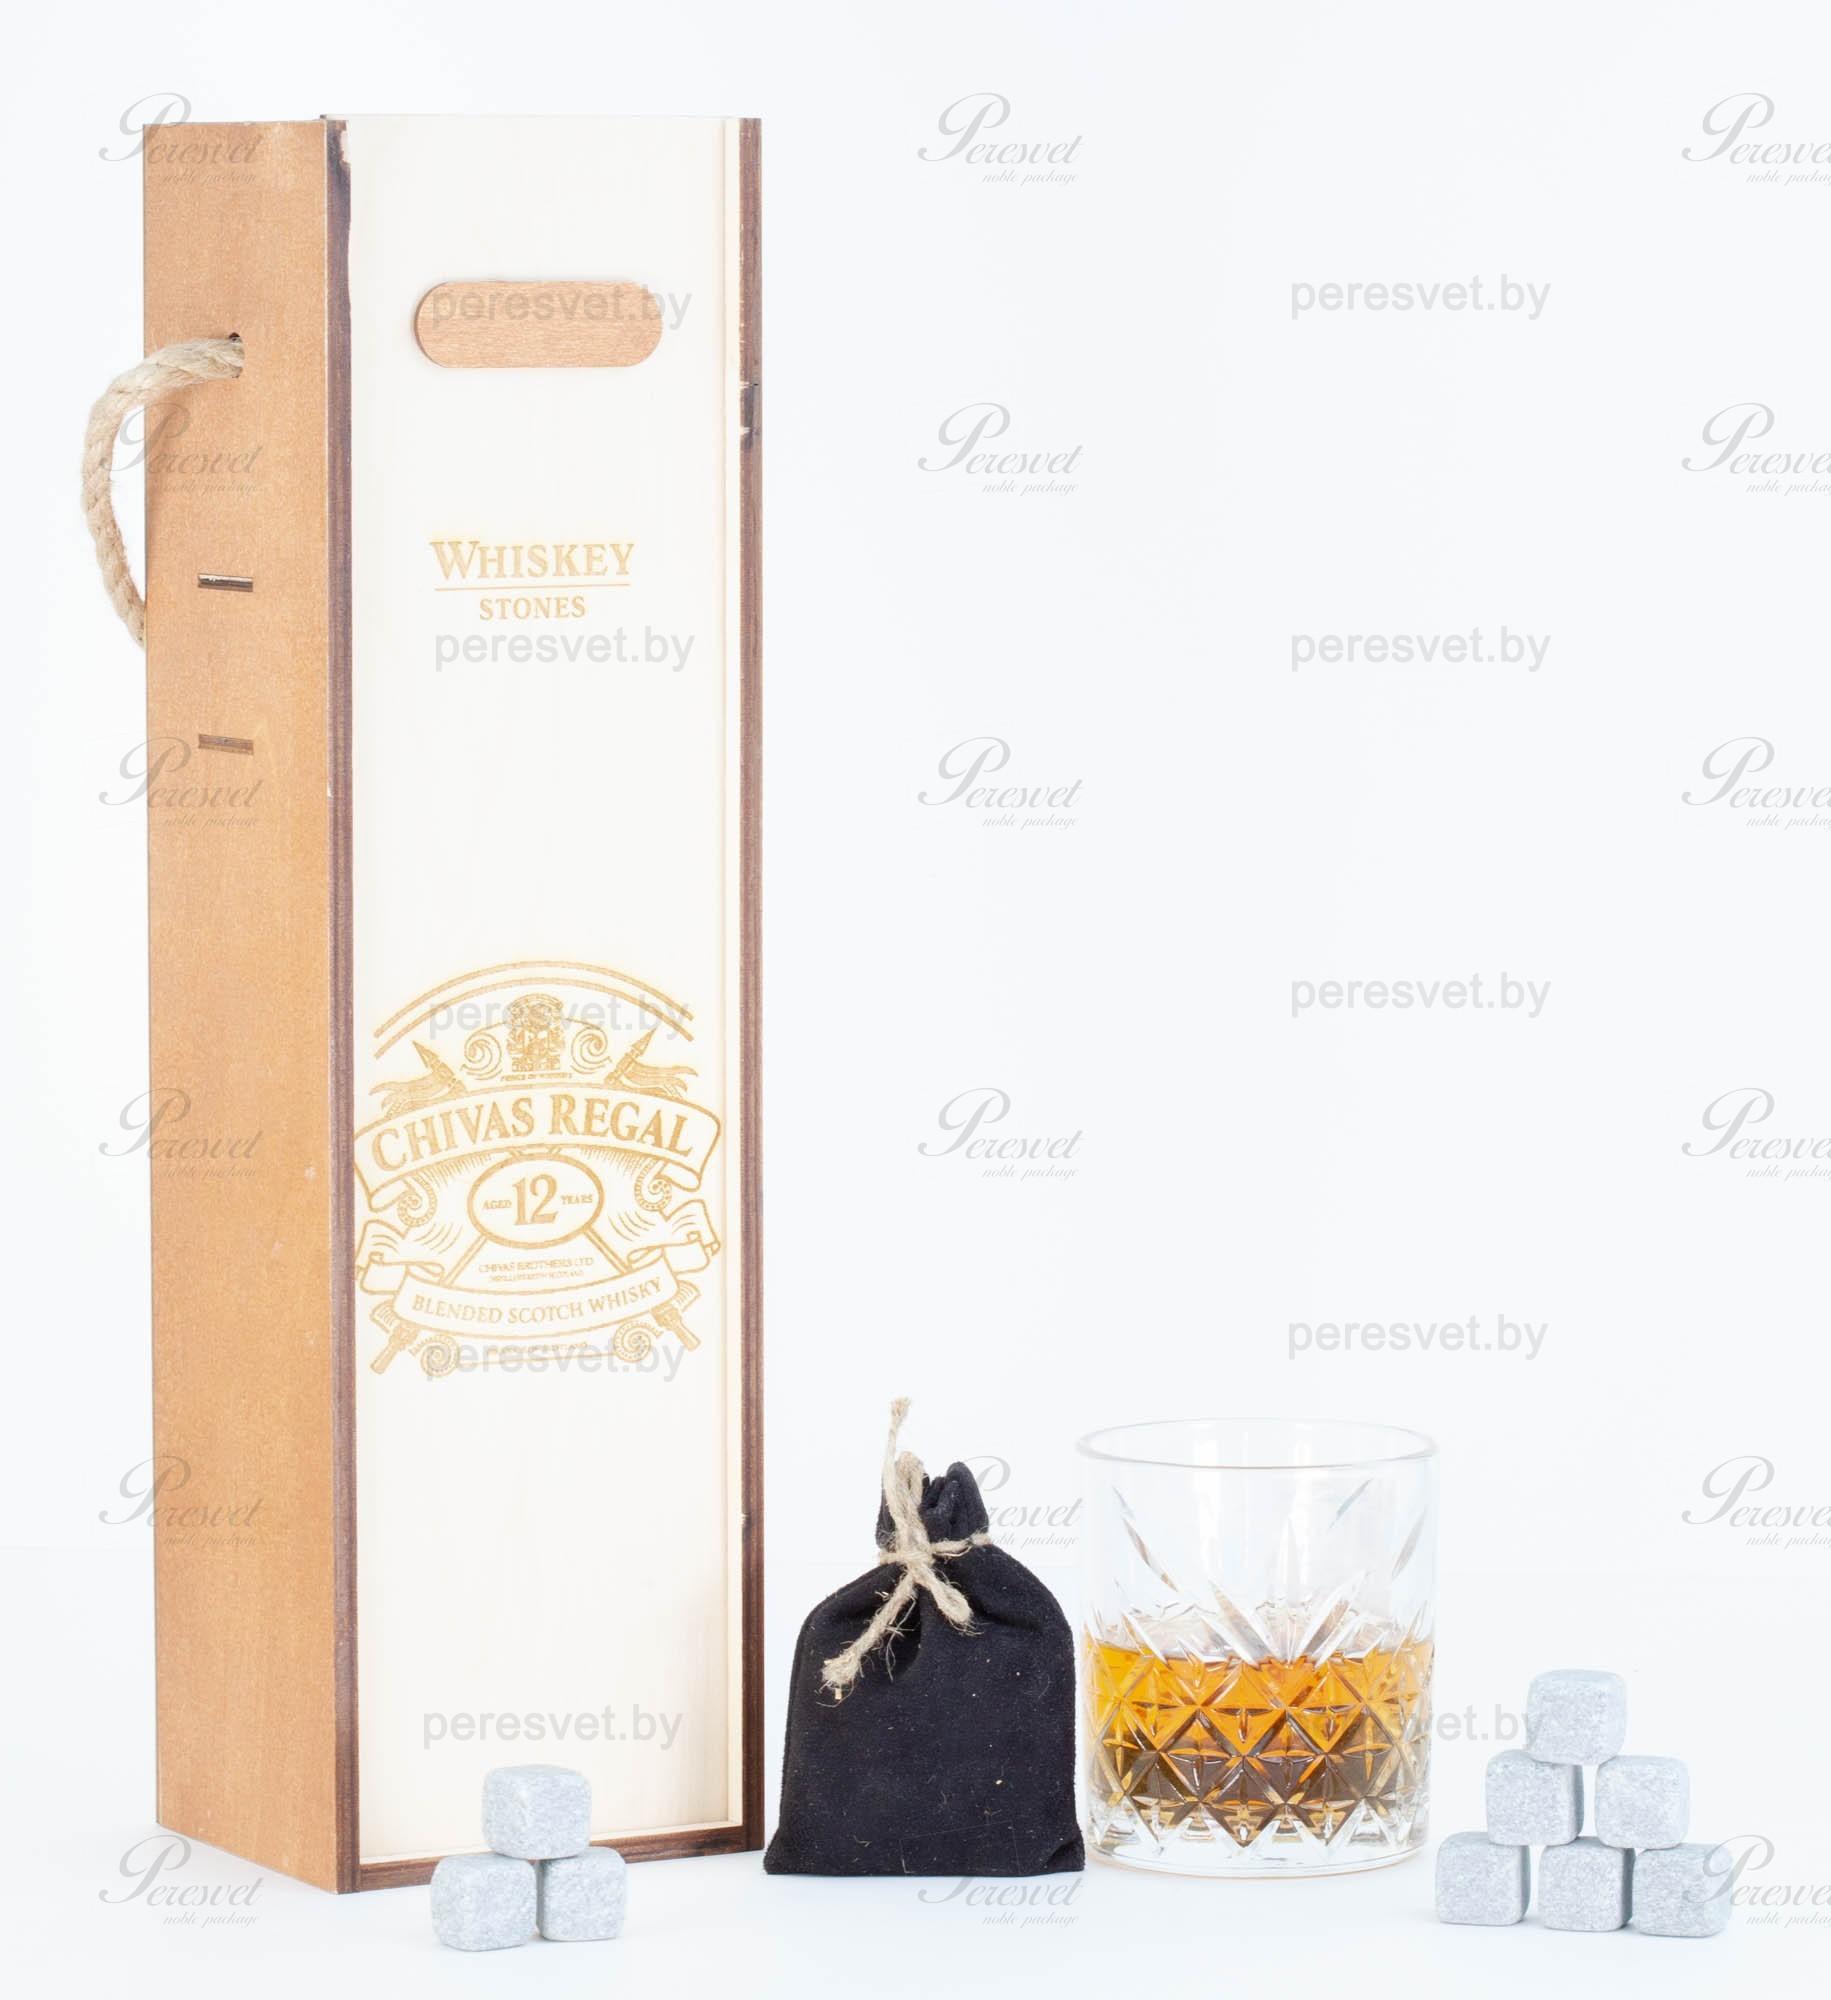 Мужской подарок под бутылку Chivas Regal со стаканам и камнями для виски на peresvet.by